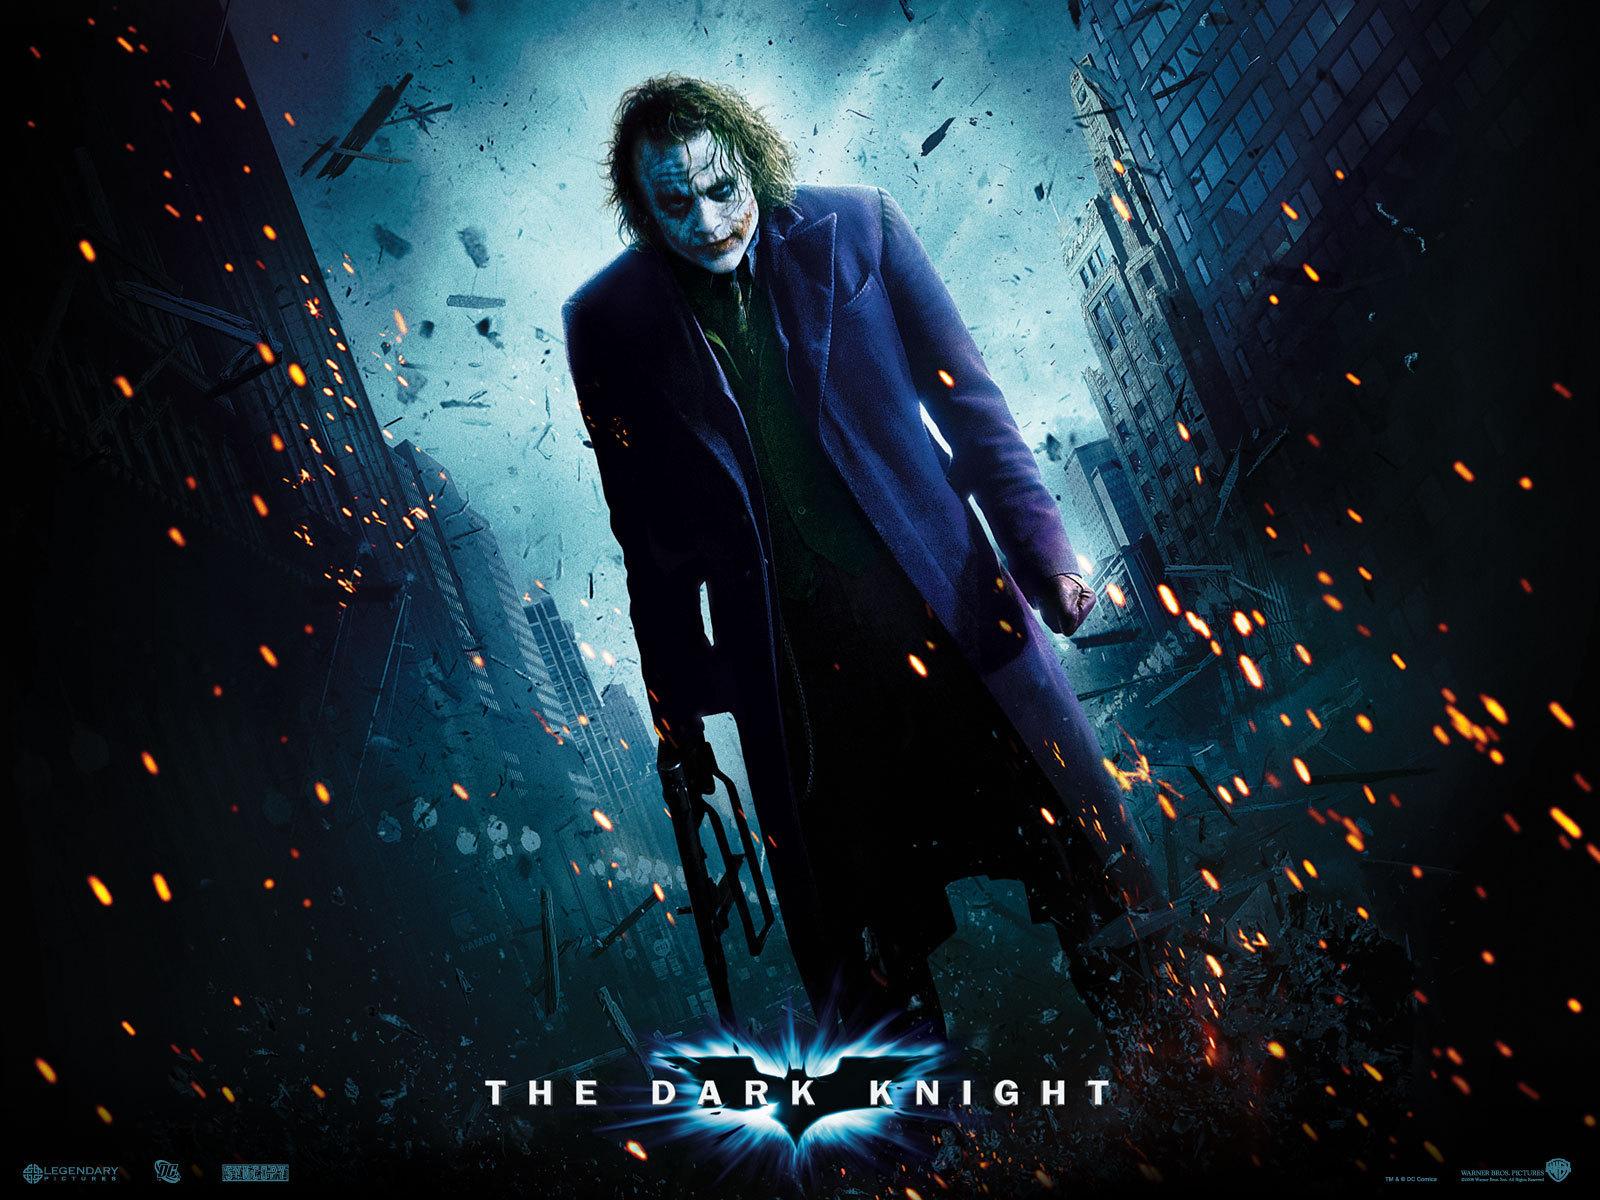 Heath Ledger as The Joker   Gotham City Wallpaper 9970933 1600x1200